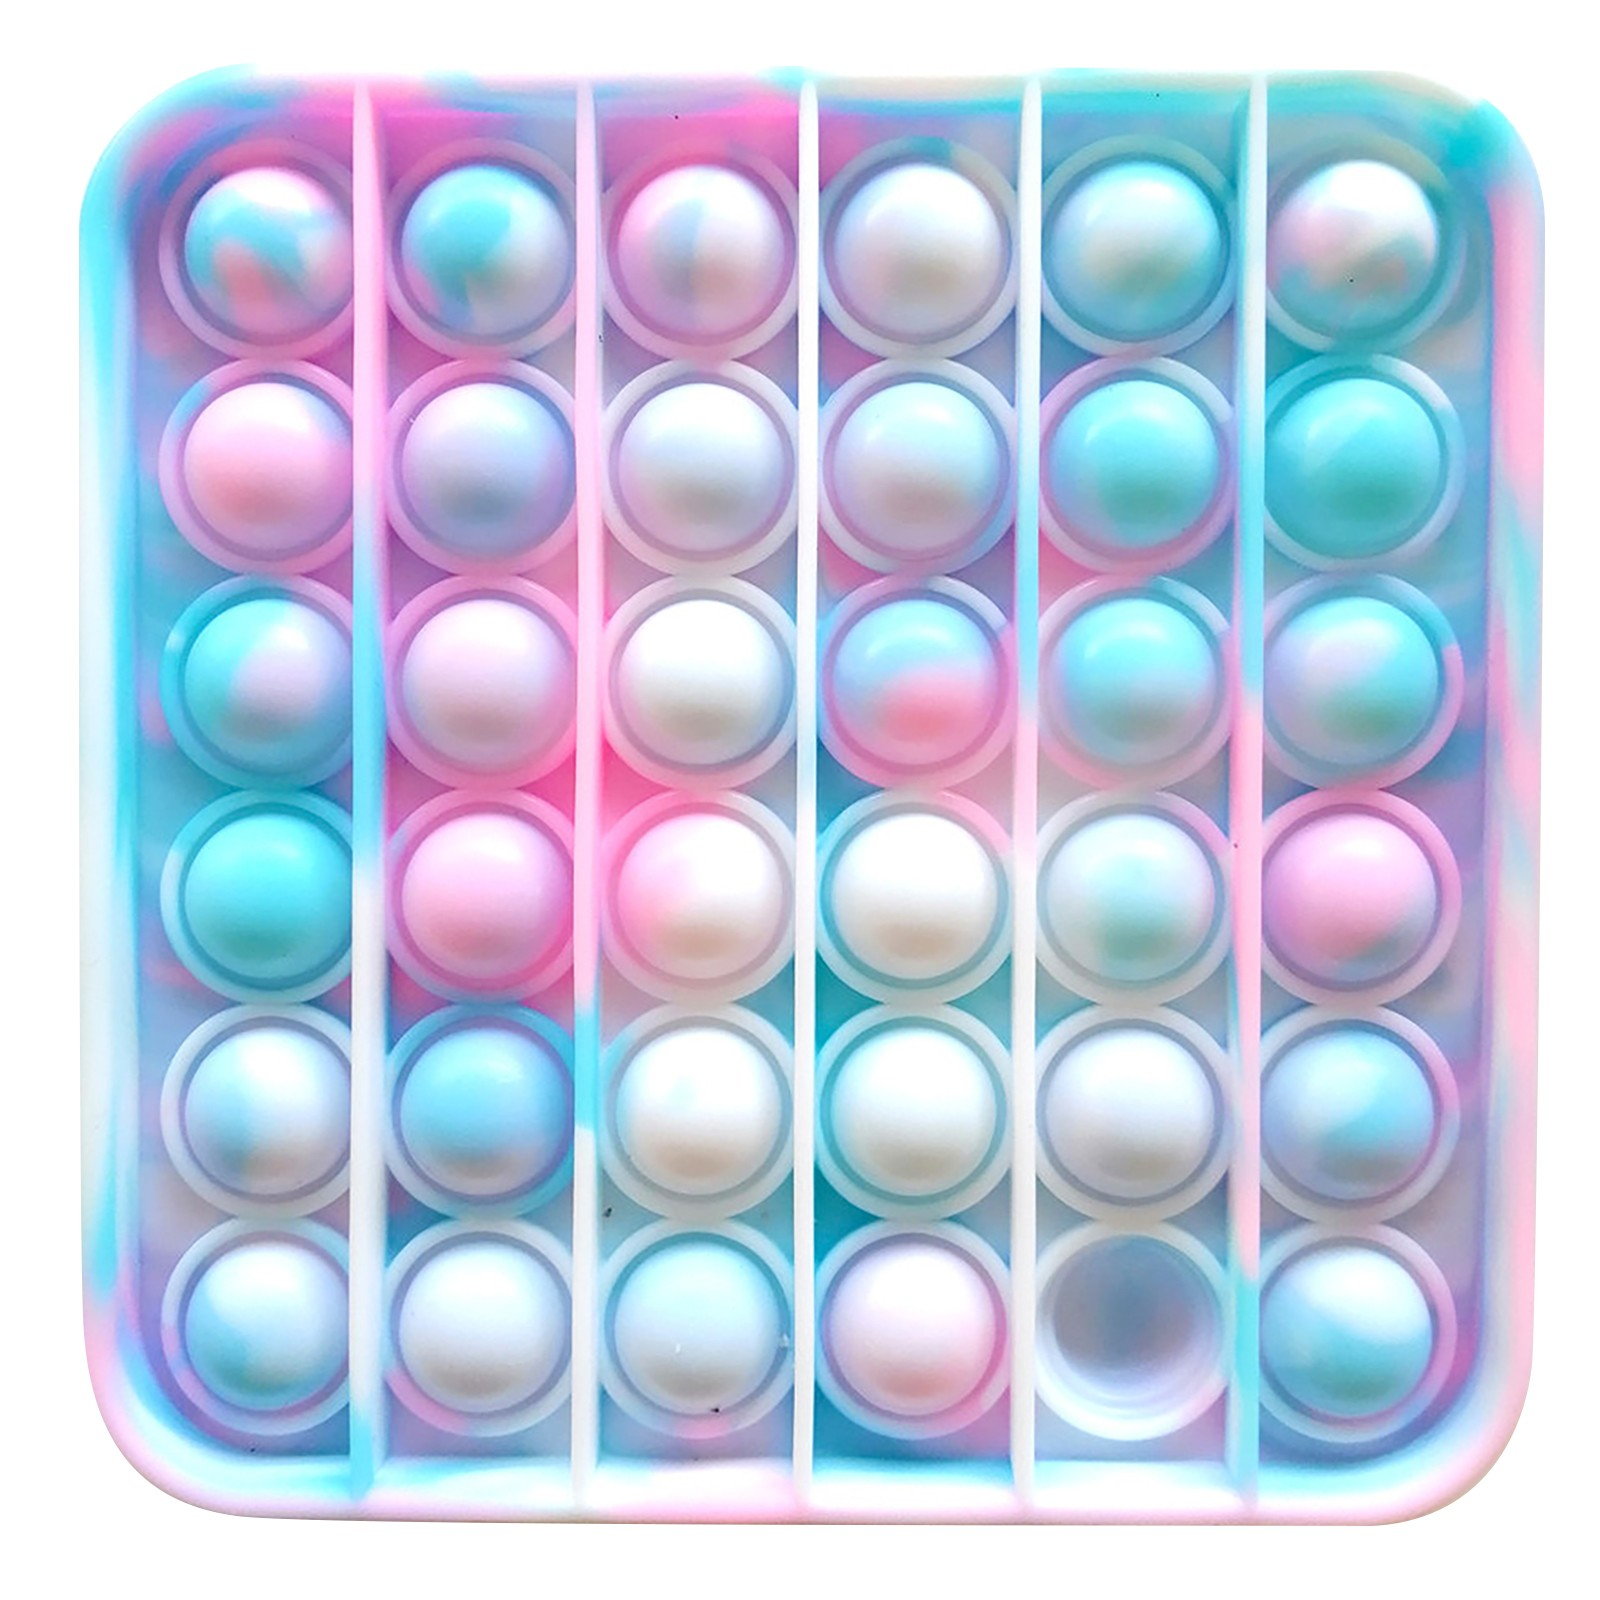 Adult Toys Fidget Rainbow Bubble-Sensory Pop-It Push-Pops Needs Anti-Stress Squishy Colorful img4